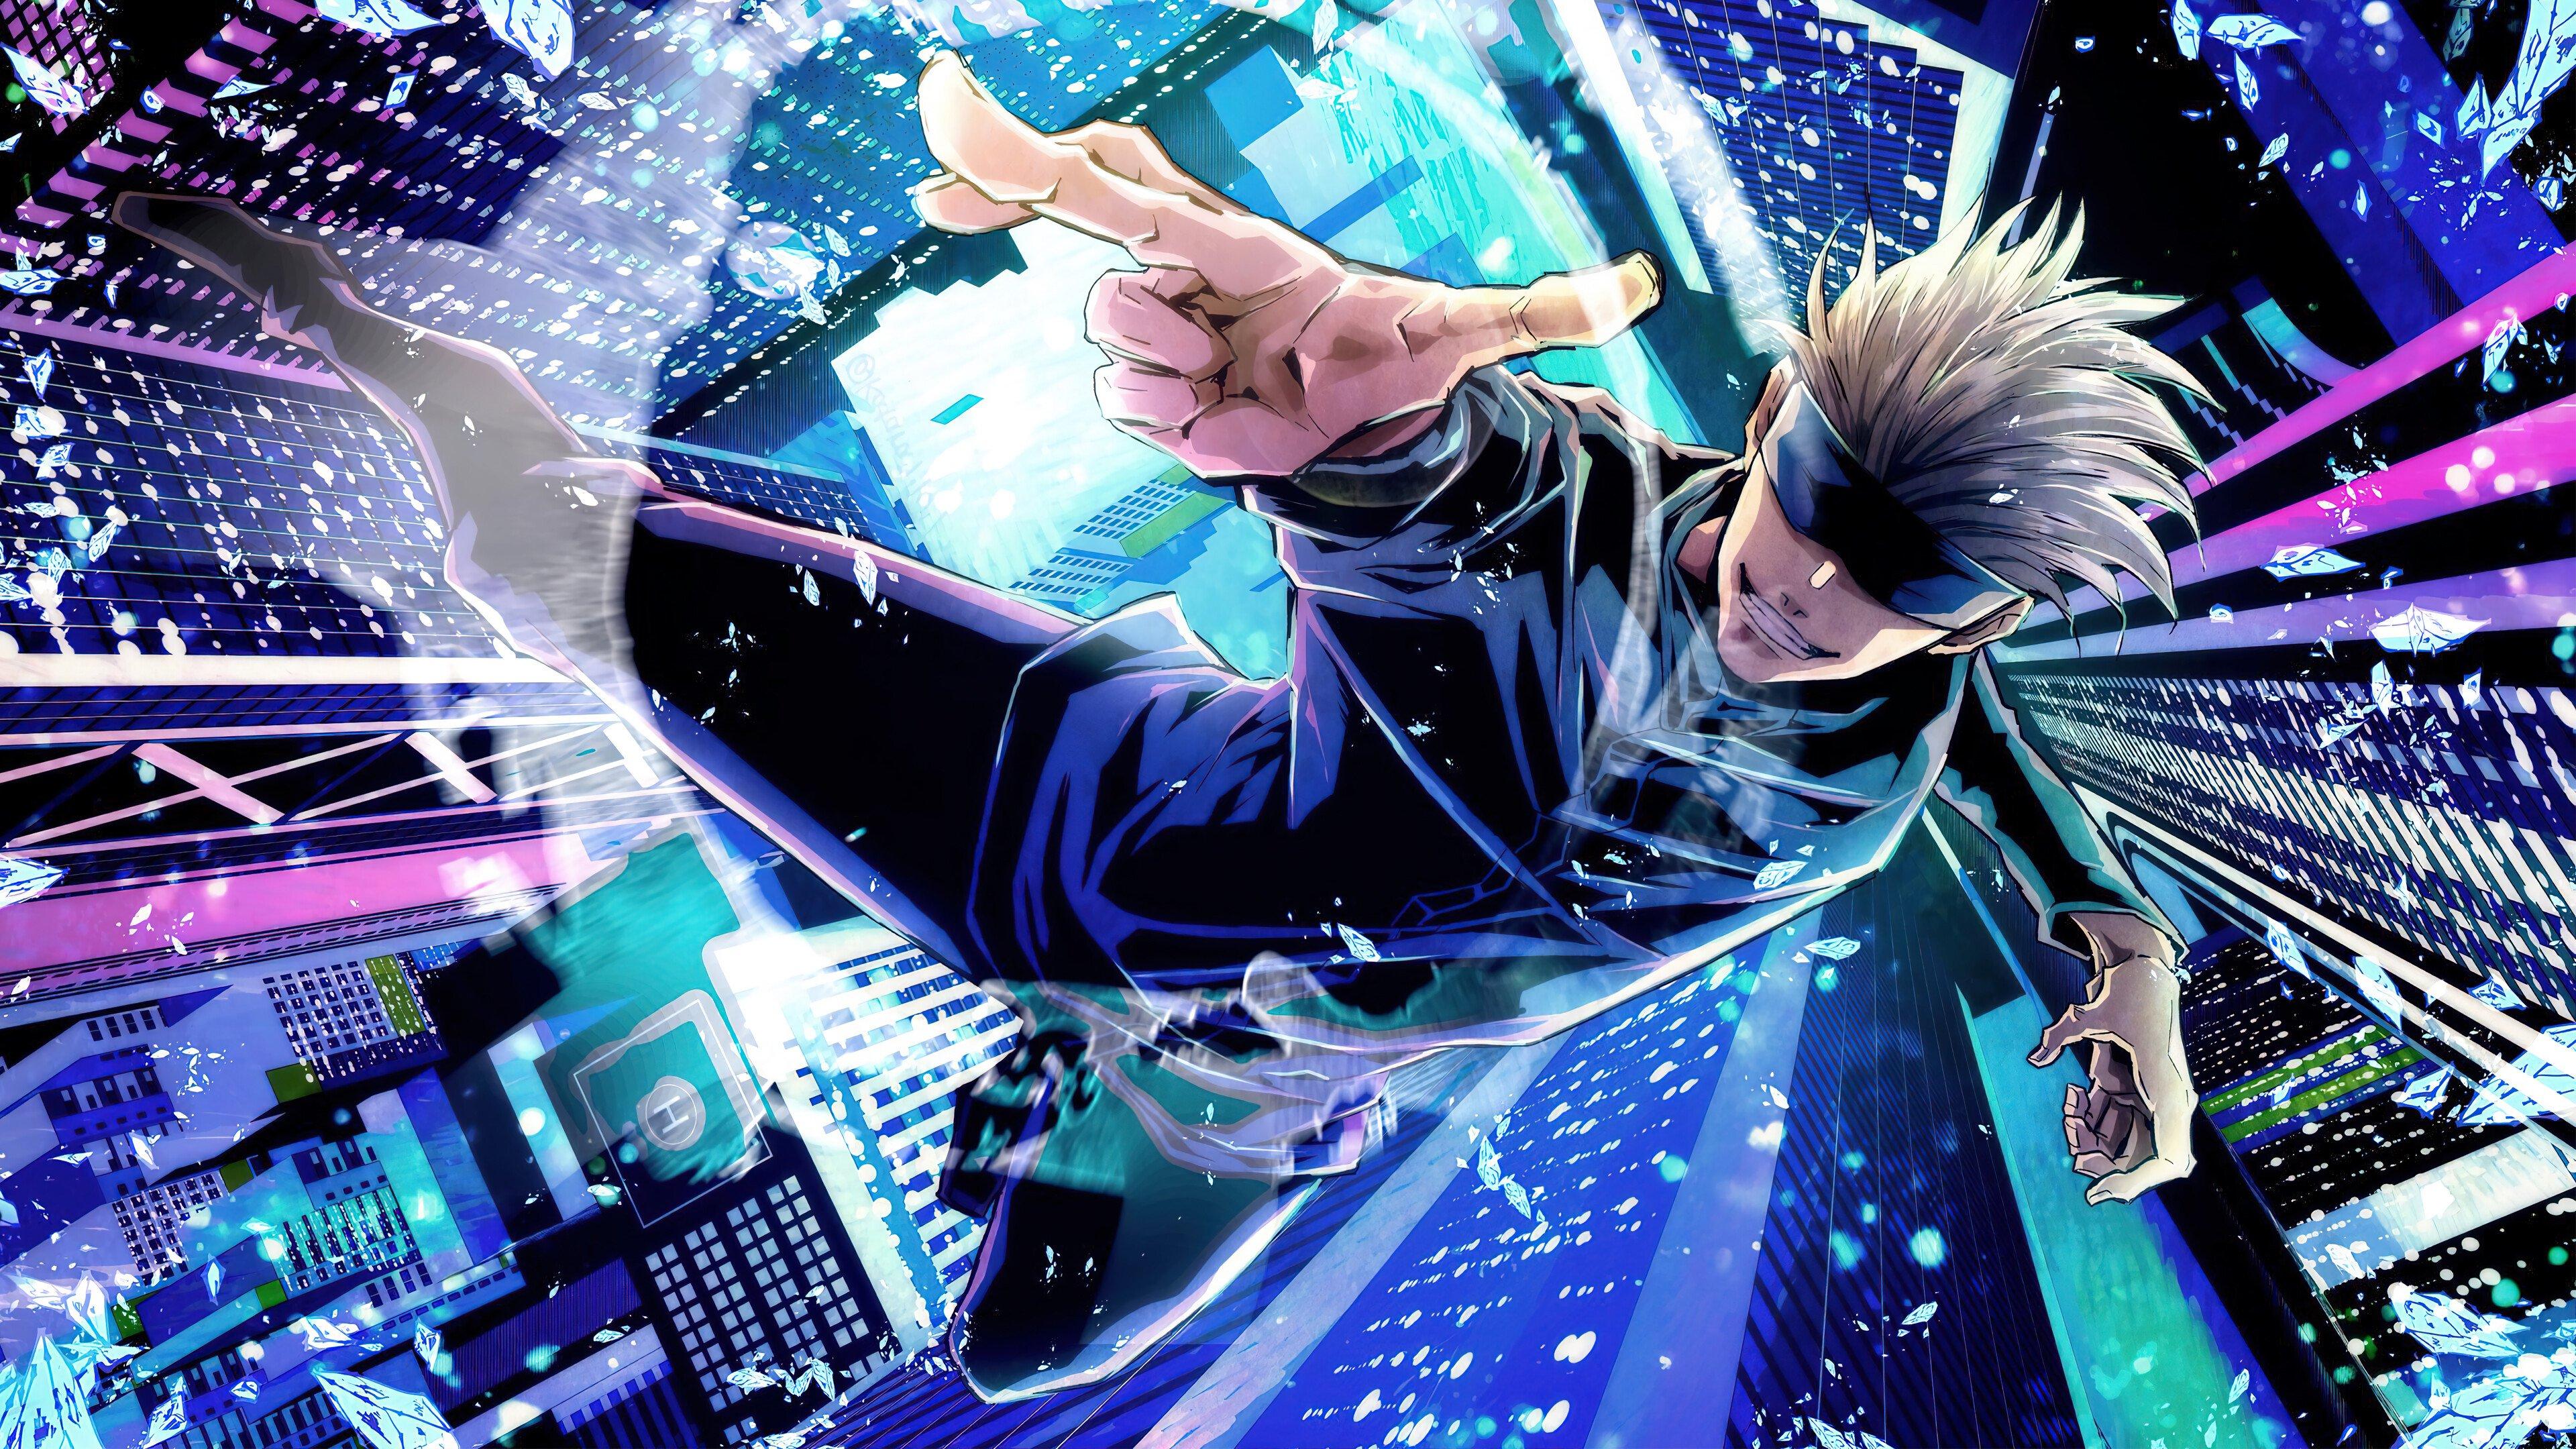 Anime Wallpaper Satoru Gojo from Jujutsu Kaisen